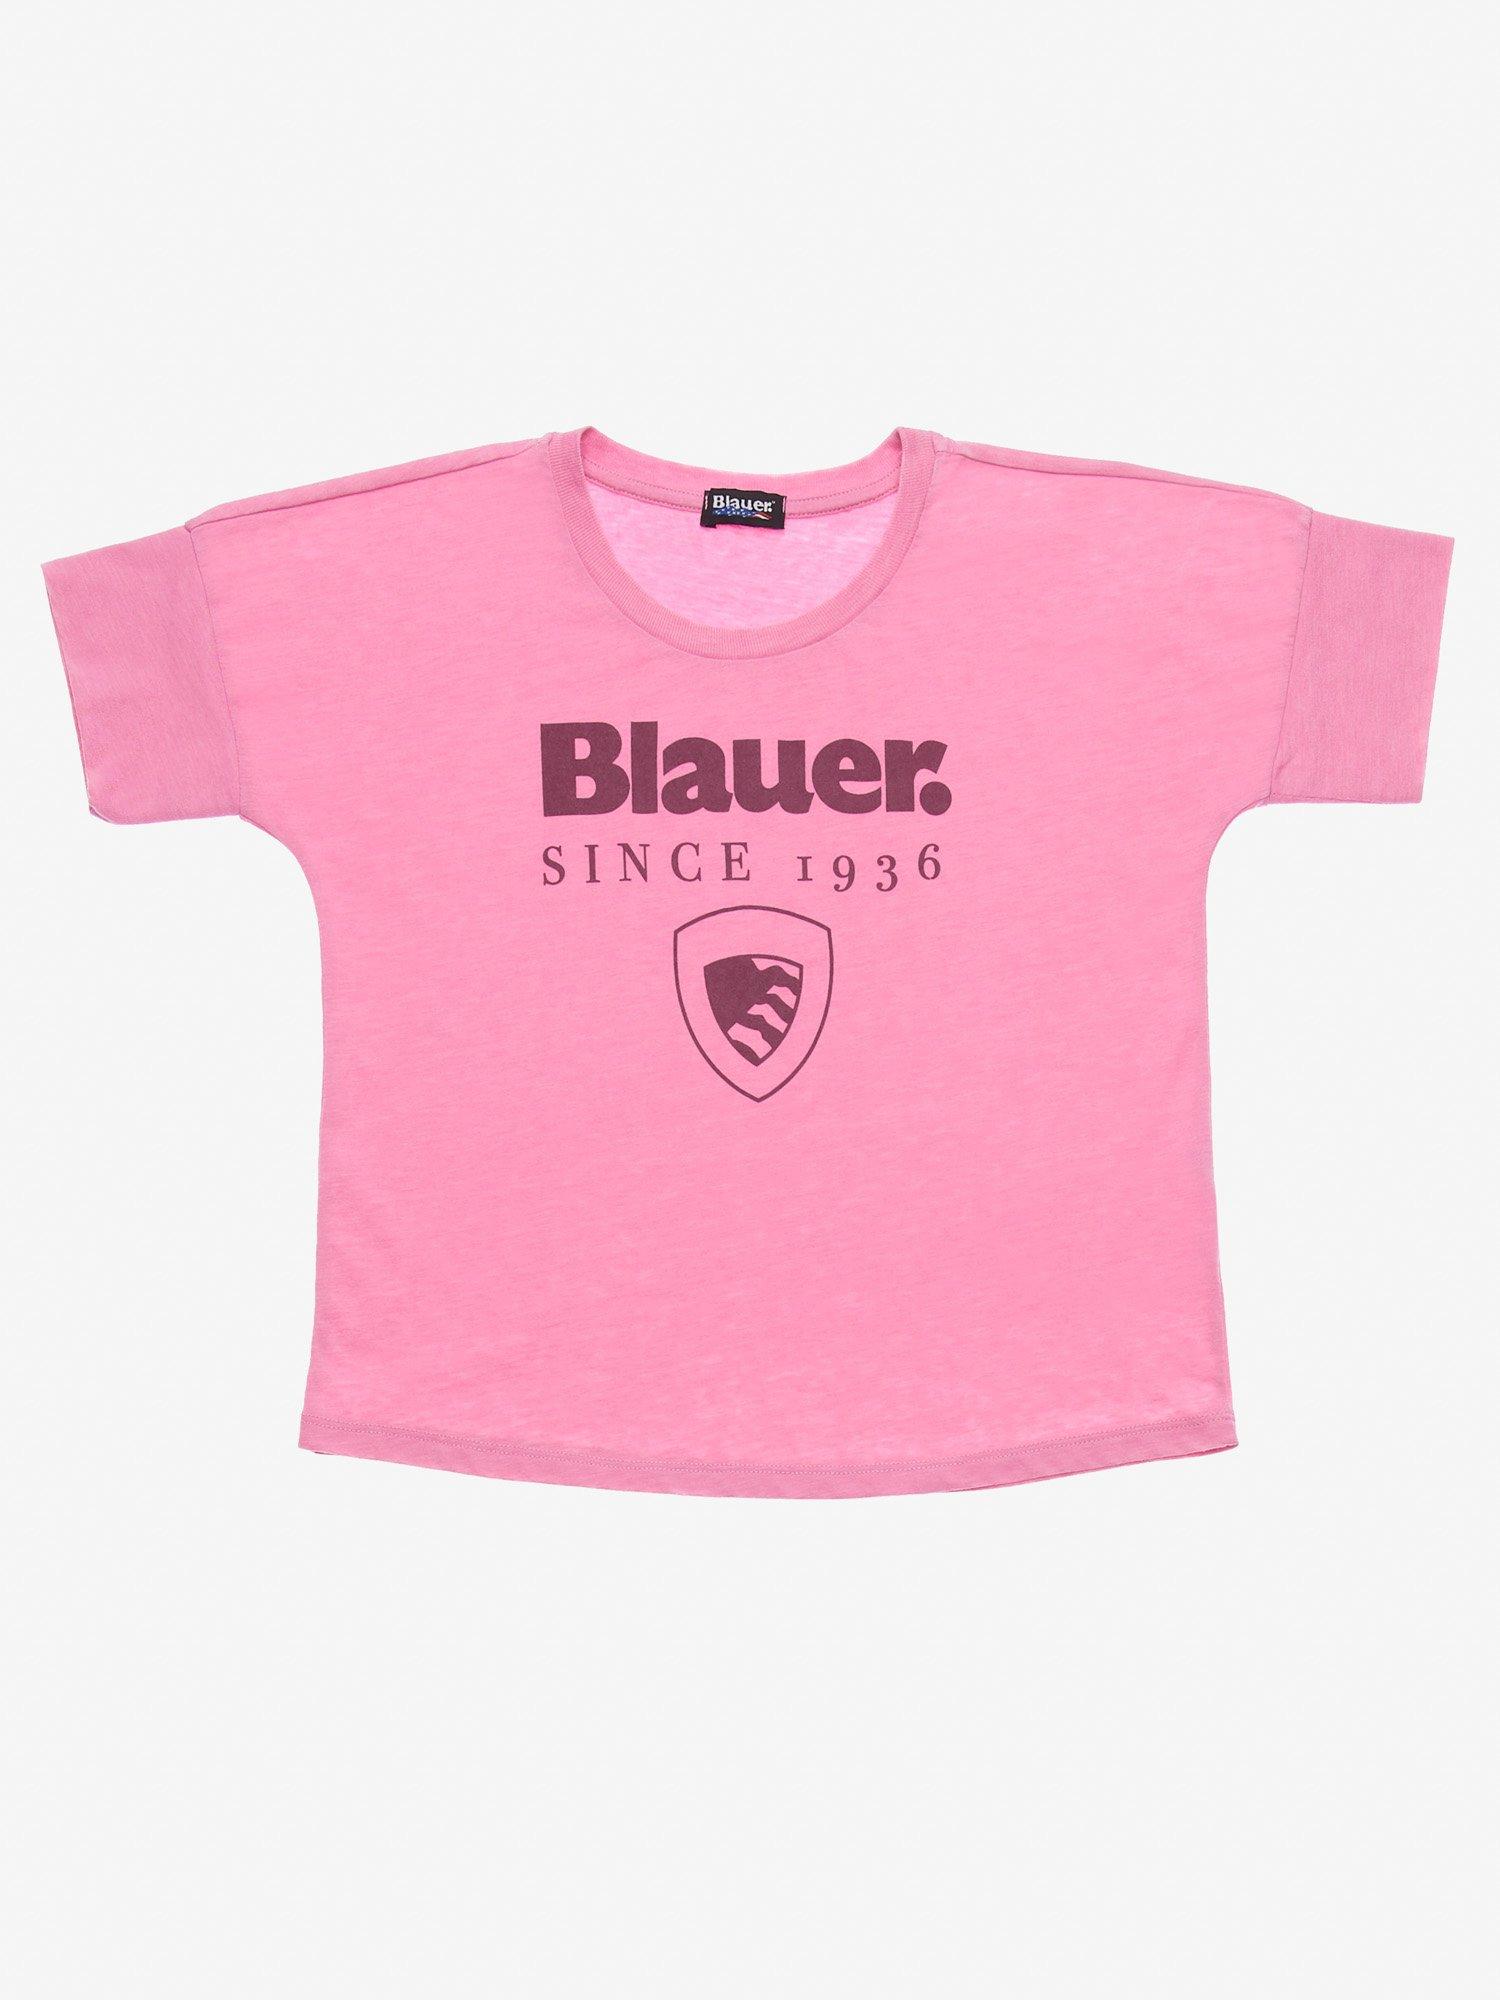 T-SHIRT JUNIOR DANZA - Blauer